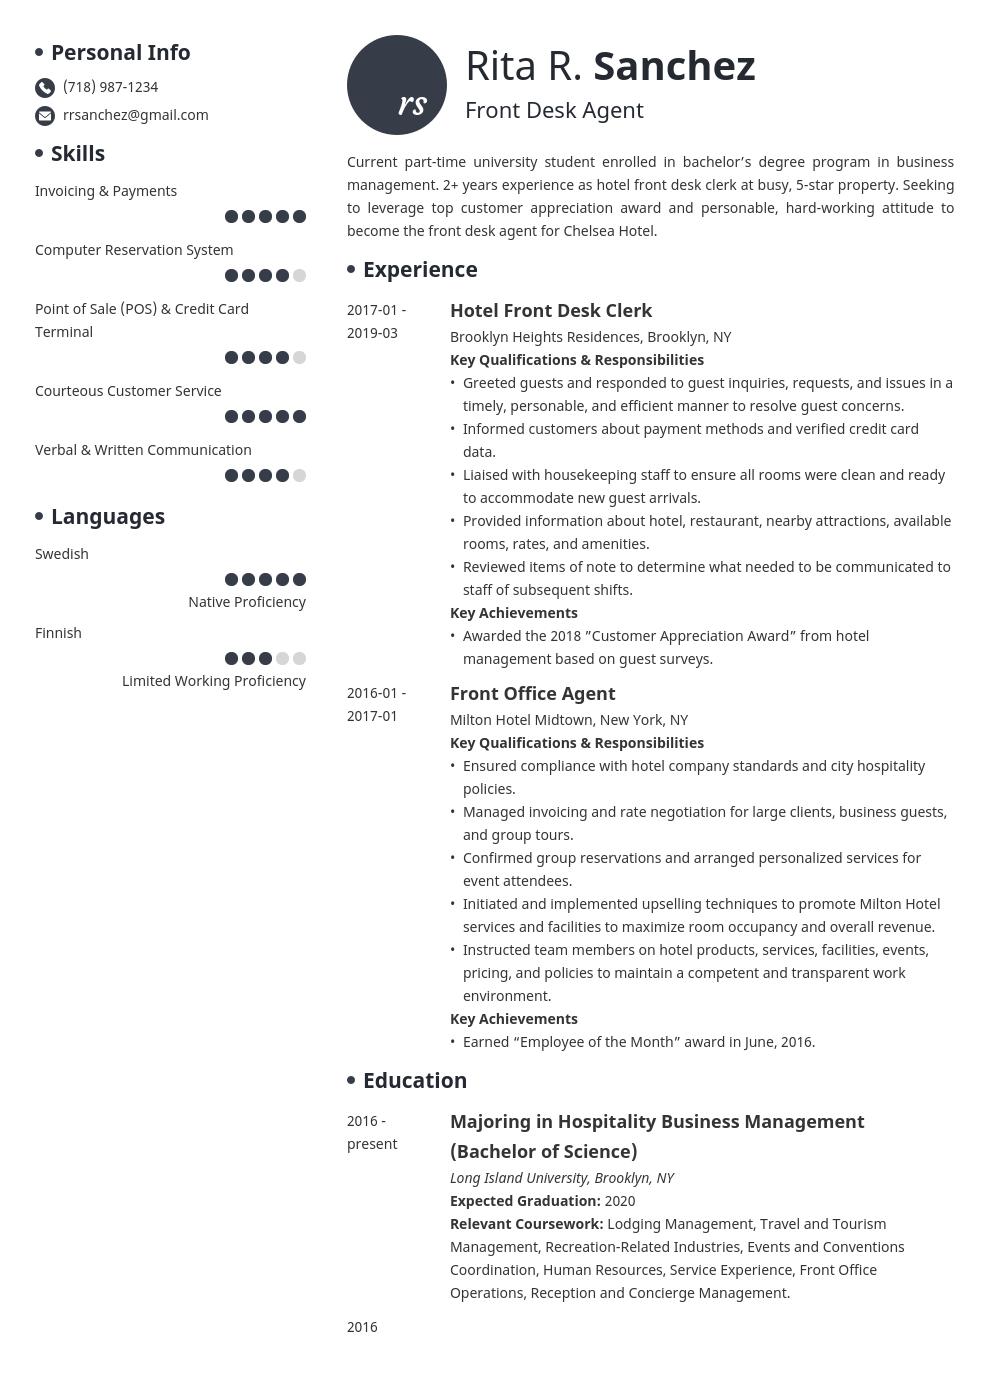 front desk resume example template initials  job resume